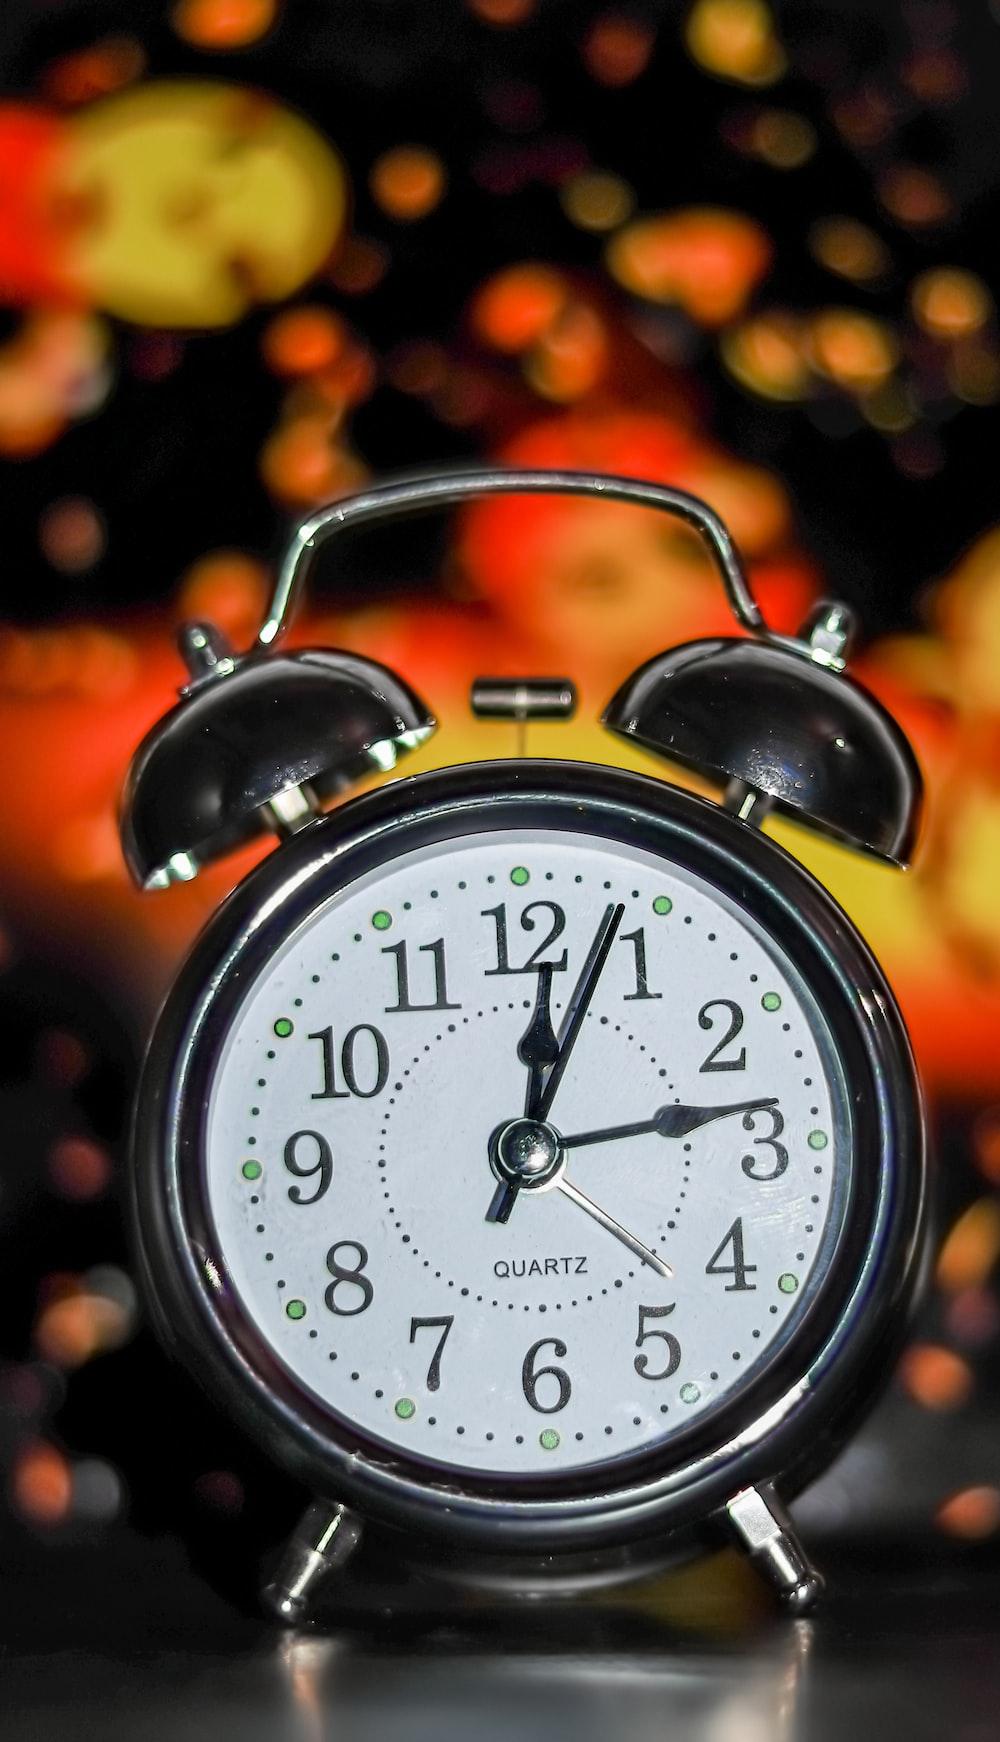 white and black alarm clock at 10 10